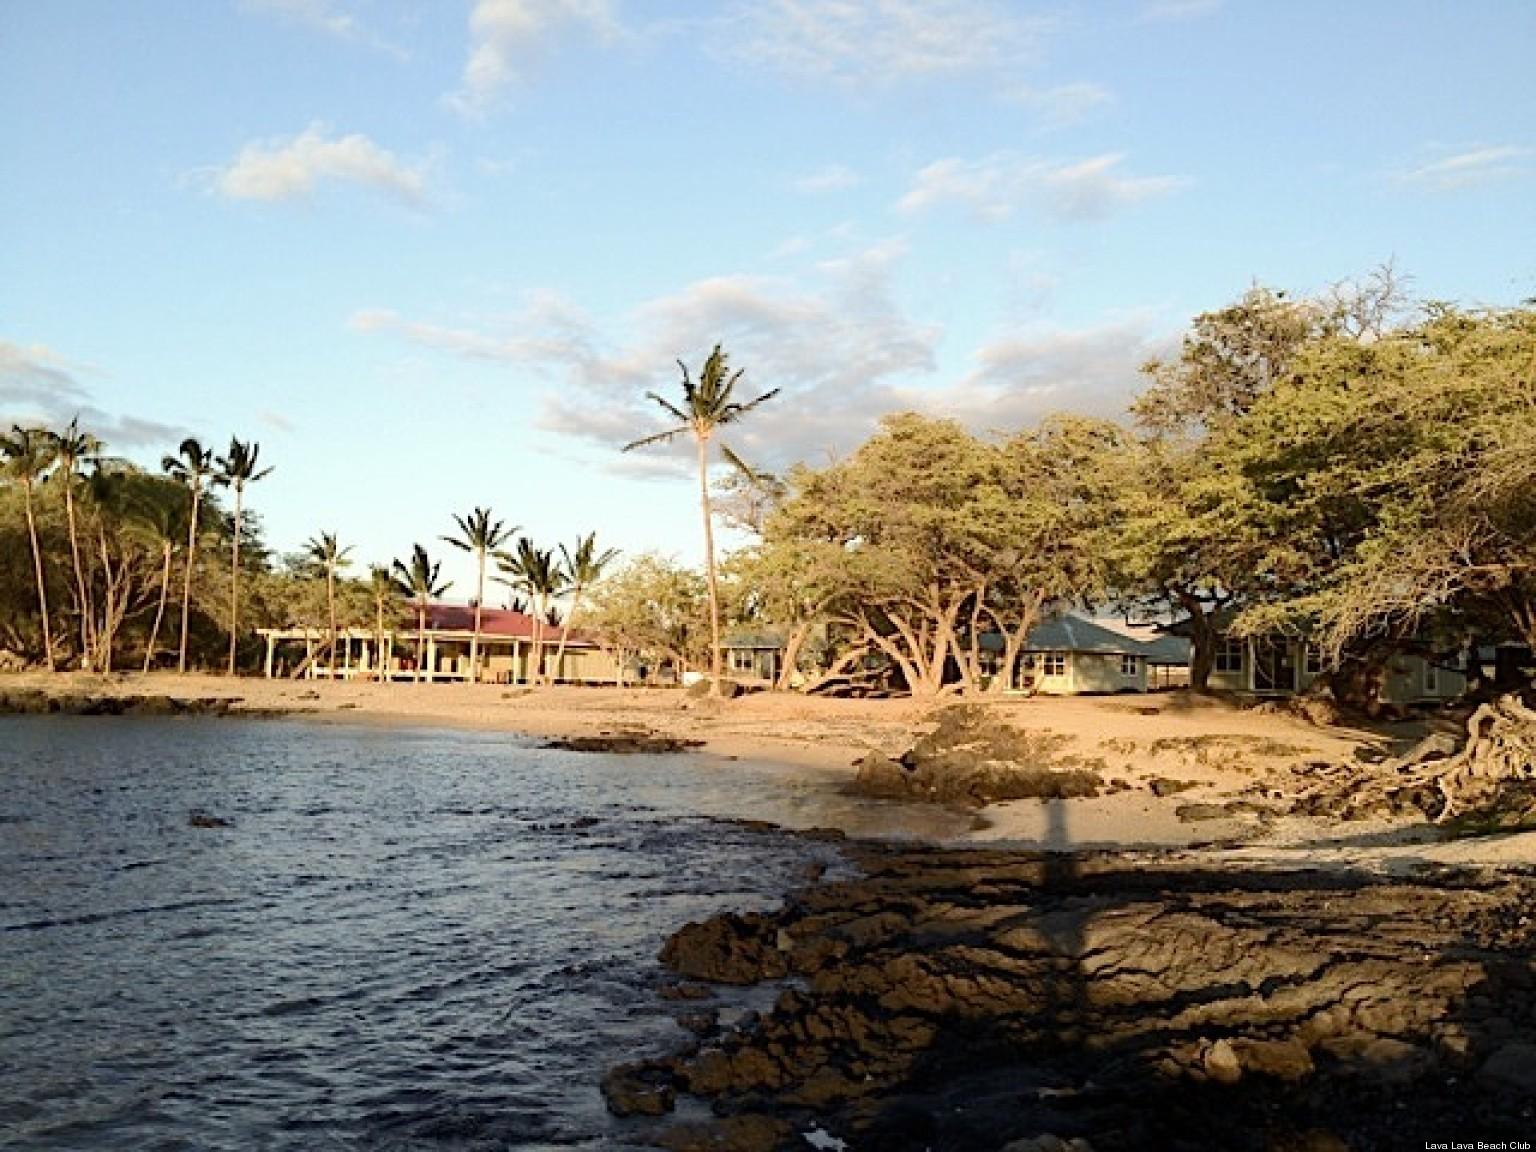 lava lava beach club an authentic hawaiian beachfront. Black Bedroom Furniture Sets. Home Design Ideas